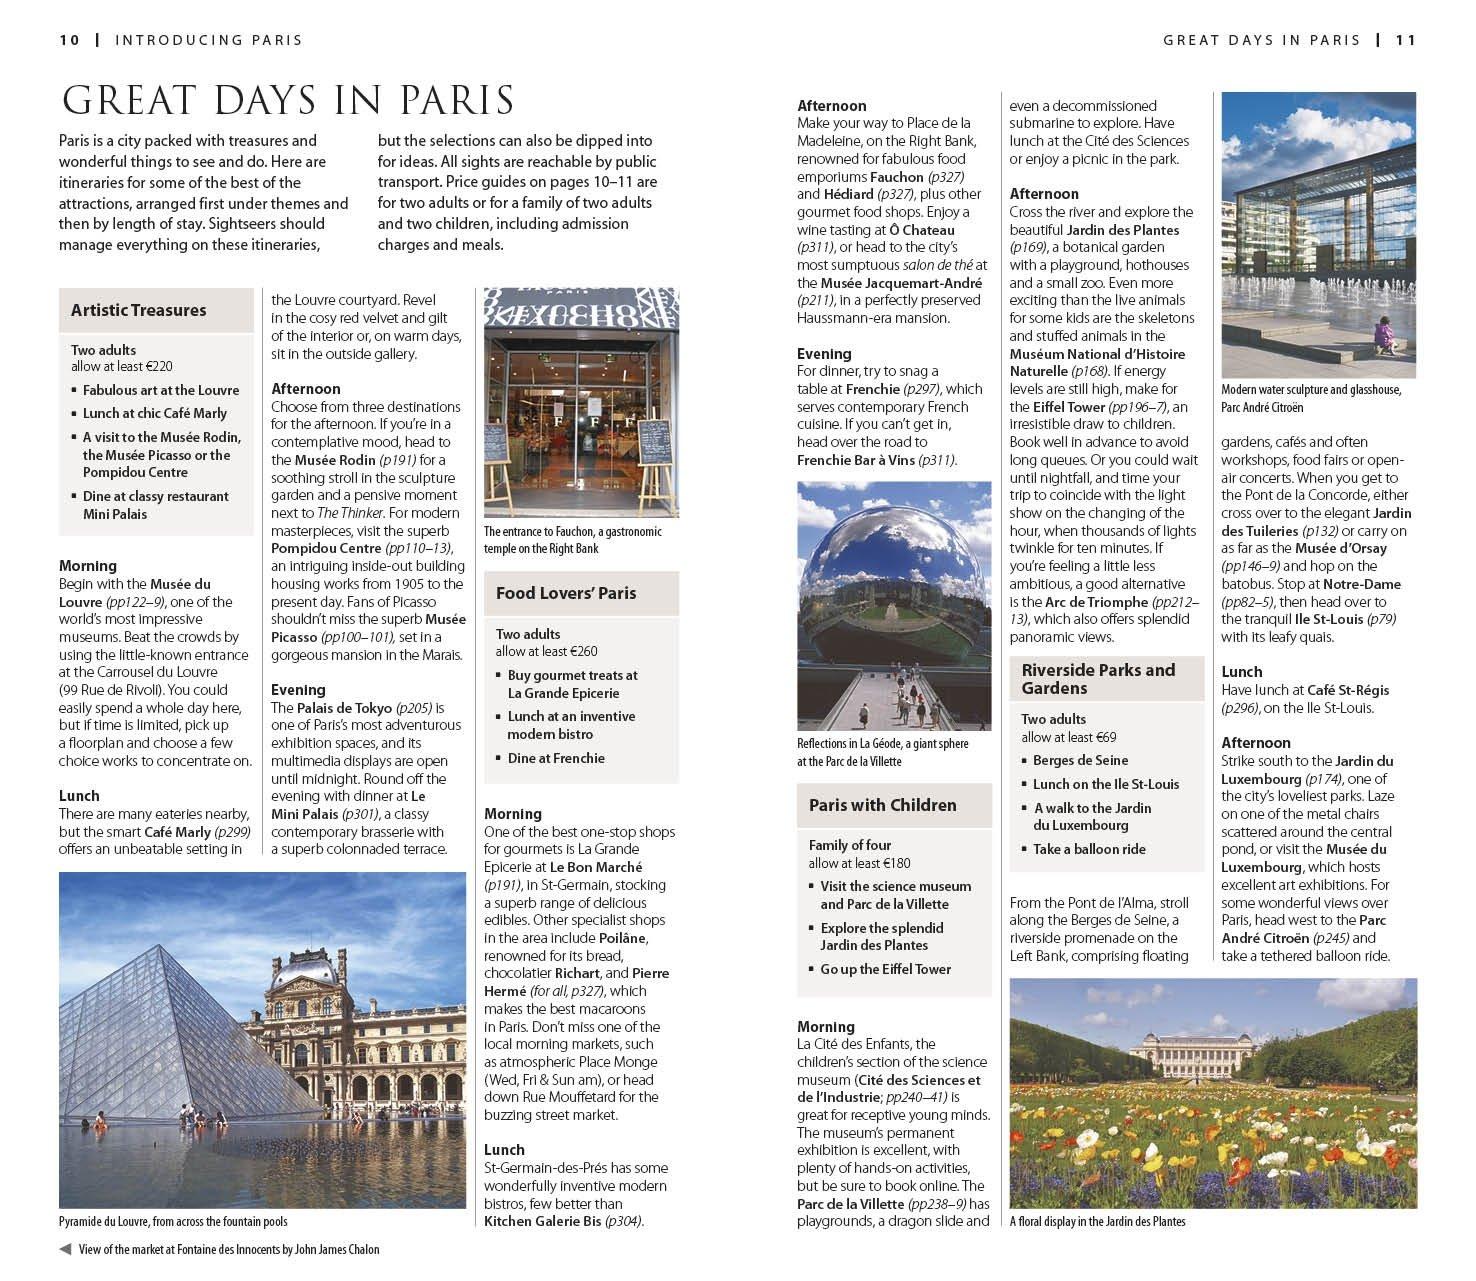 DK Eyewitness Travel Guide Paris: 2018: DK Travel: 9781465460455 ...